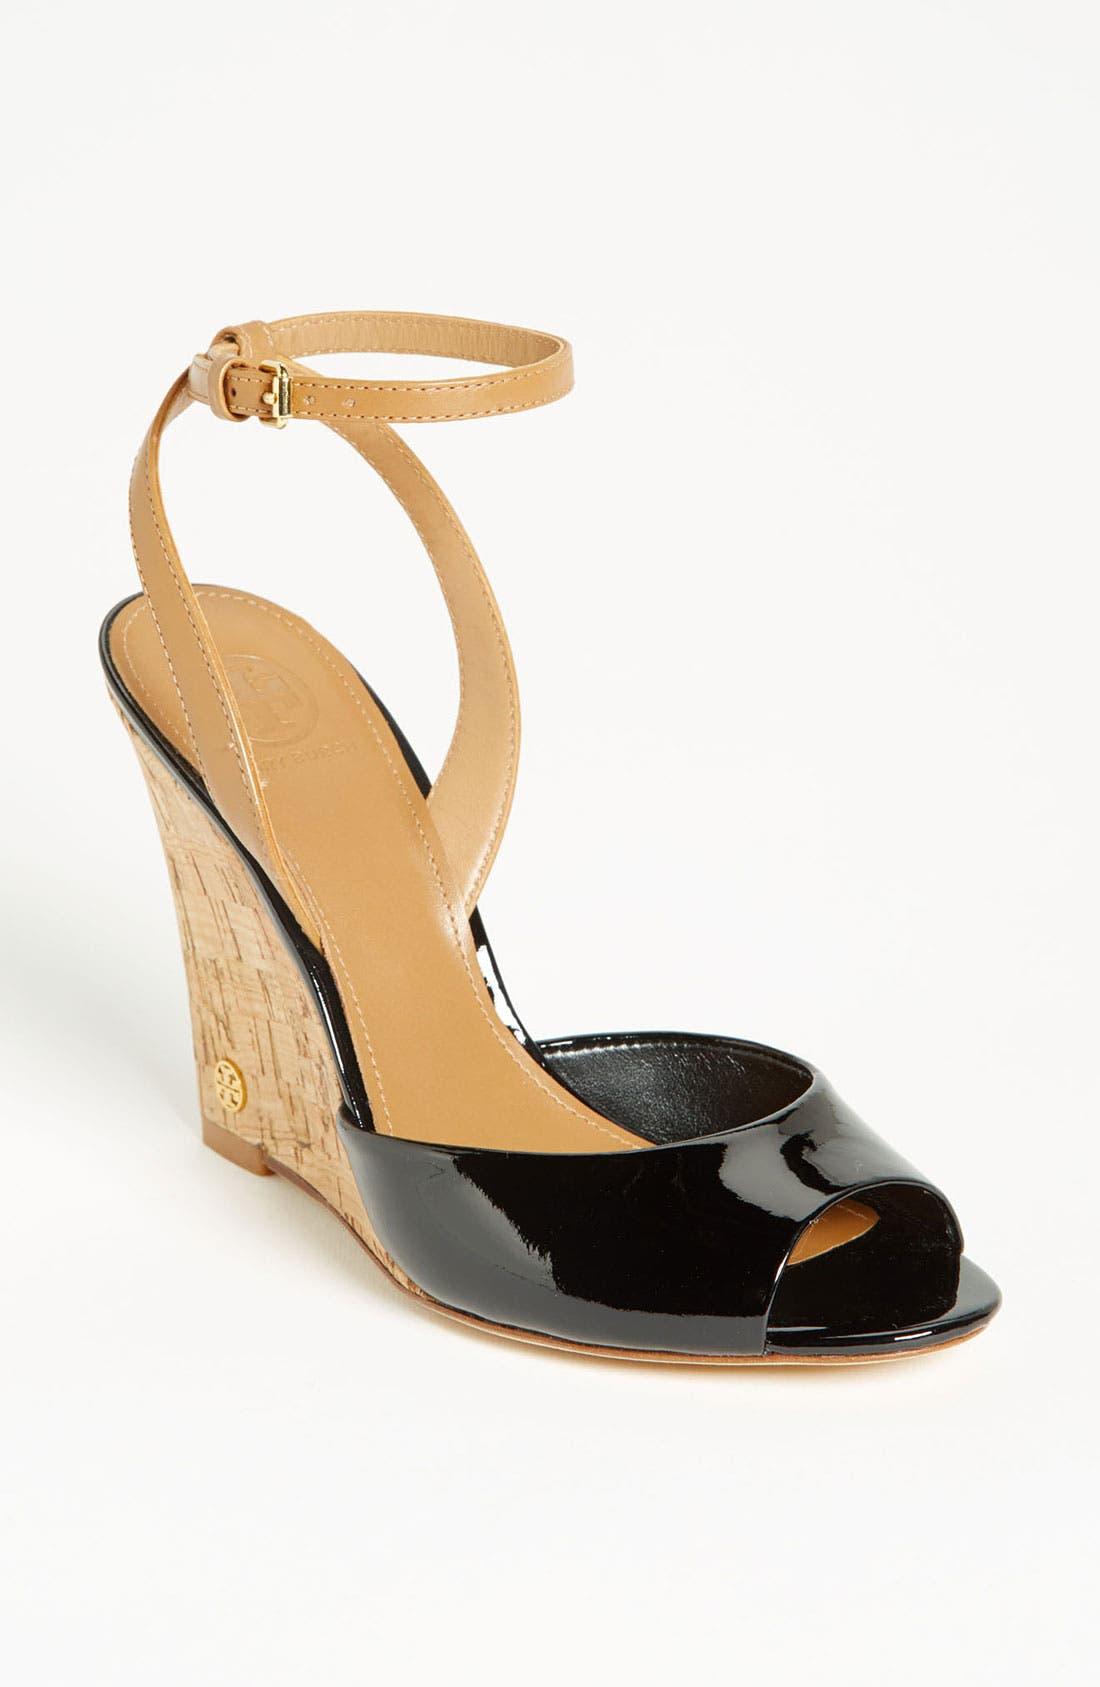 Main Image - Tory Burch 'Ashton' Sandal